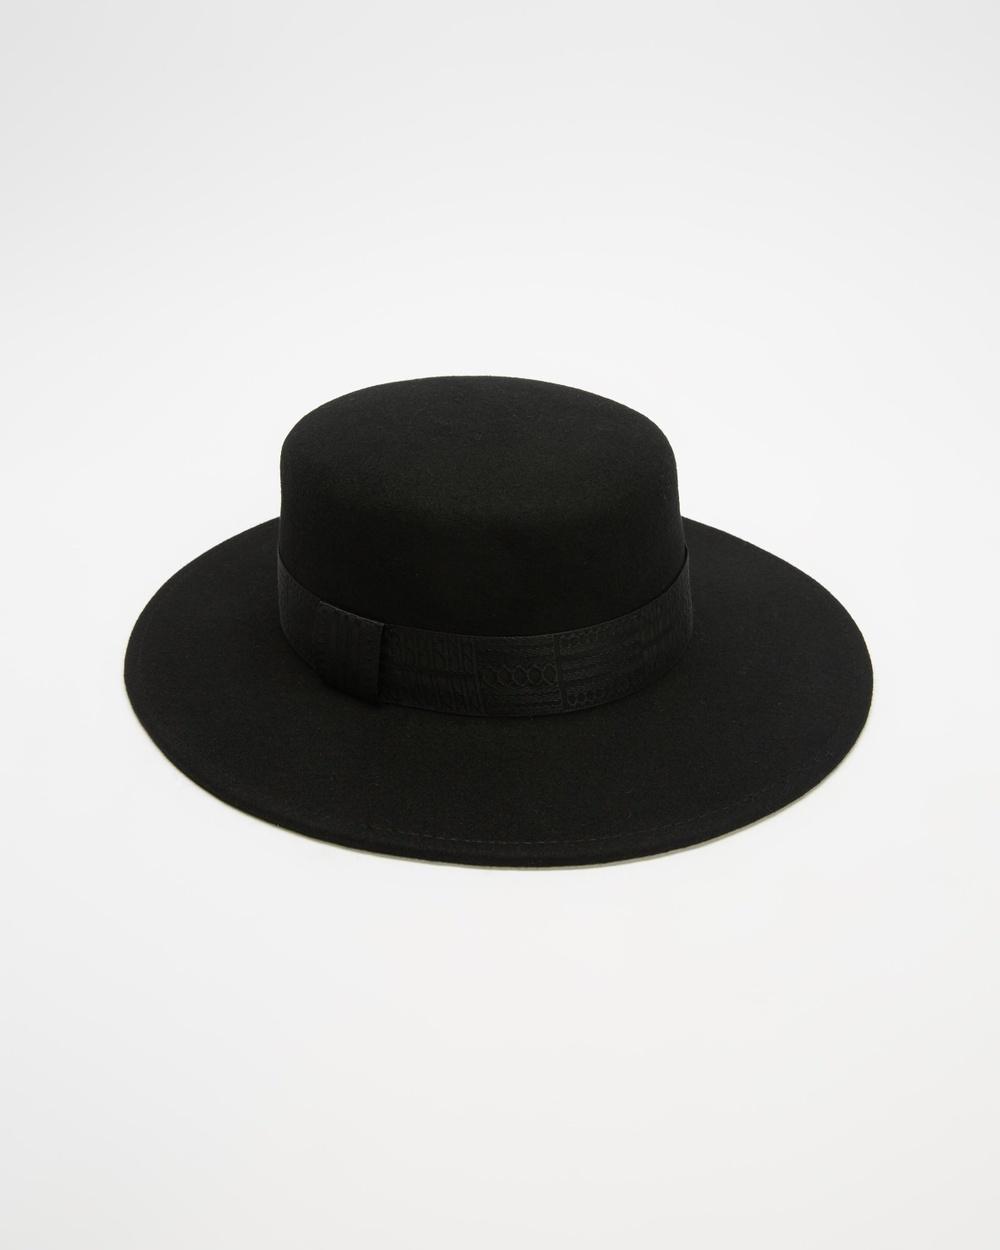 Ace Of Something Gunsmoke Boater Hats Black